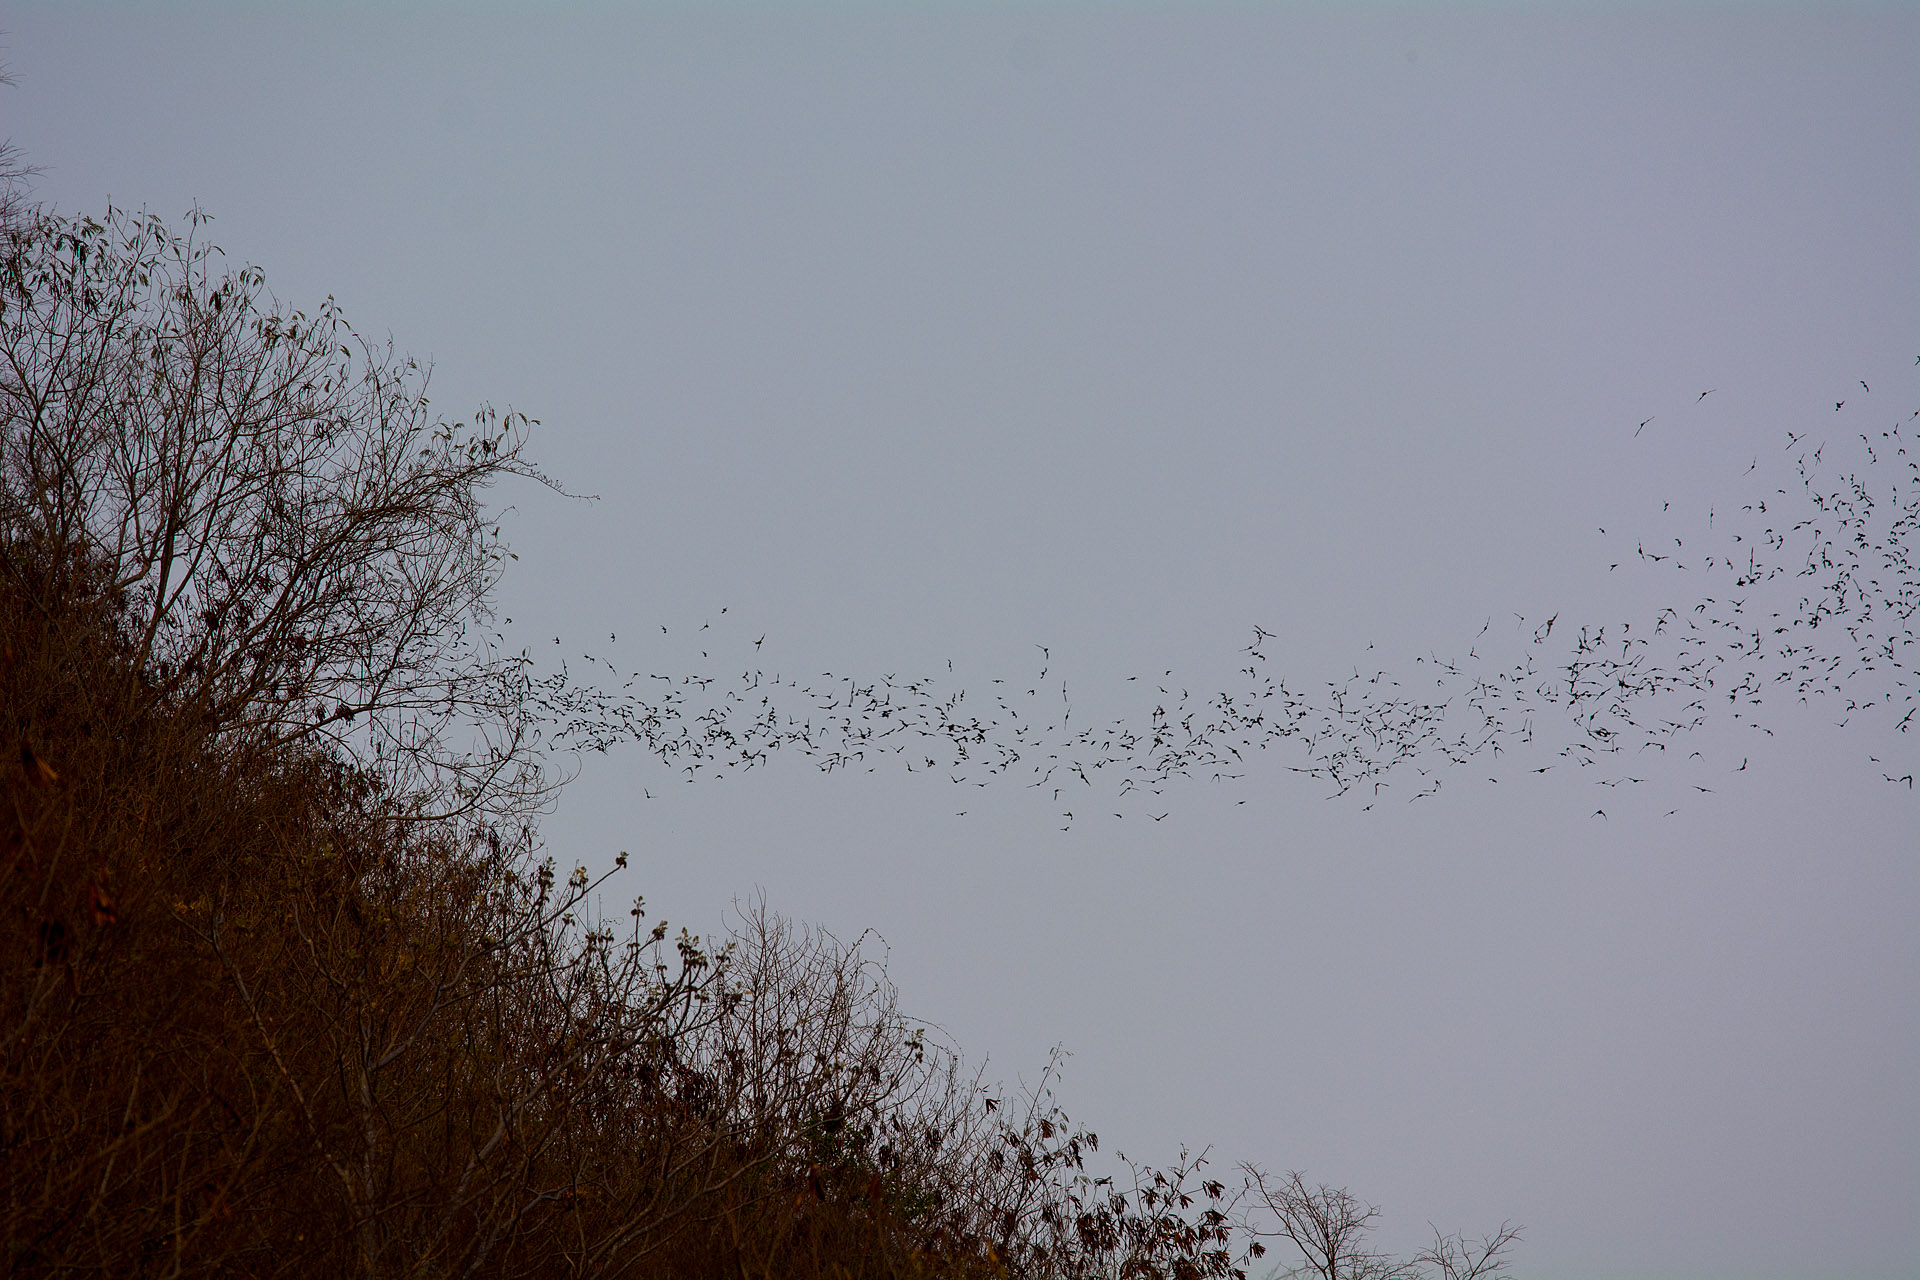 Horseshoe bats emerging from Khao Lak Chang